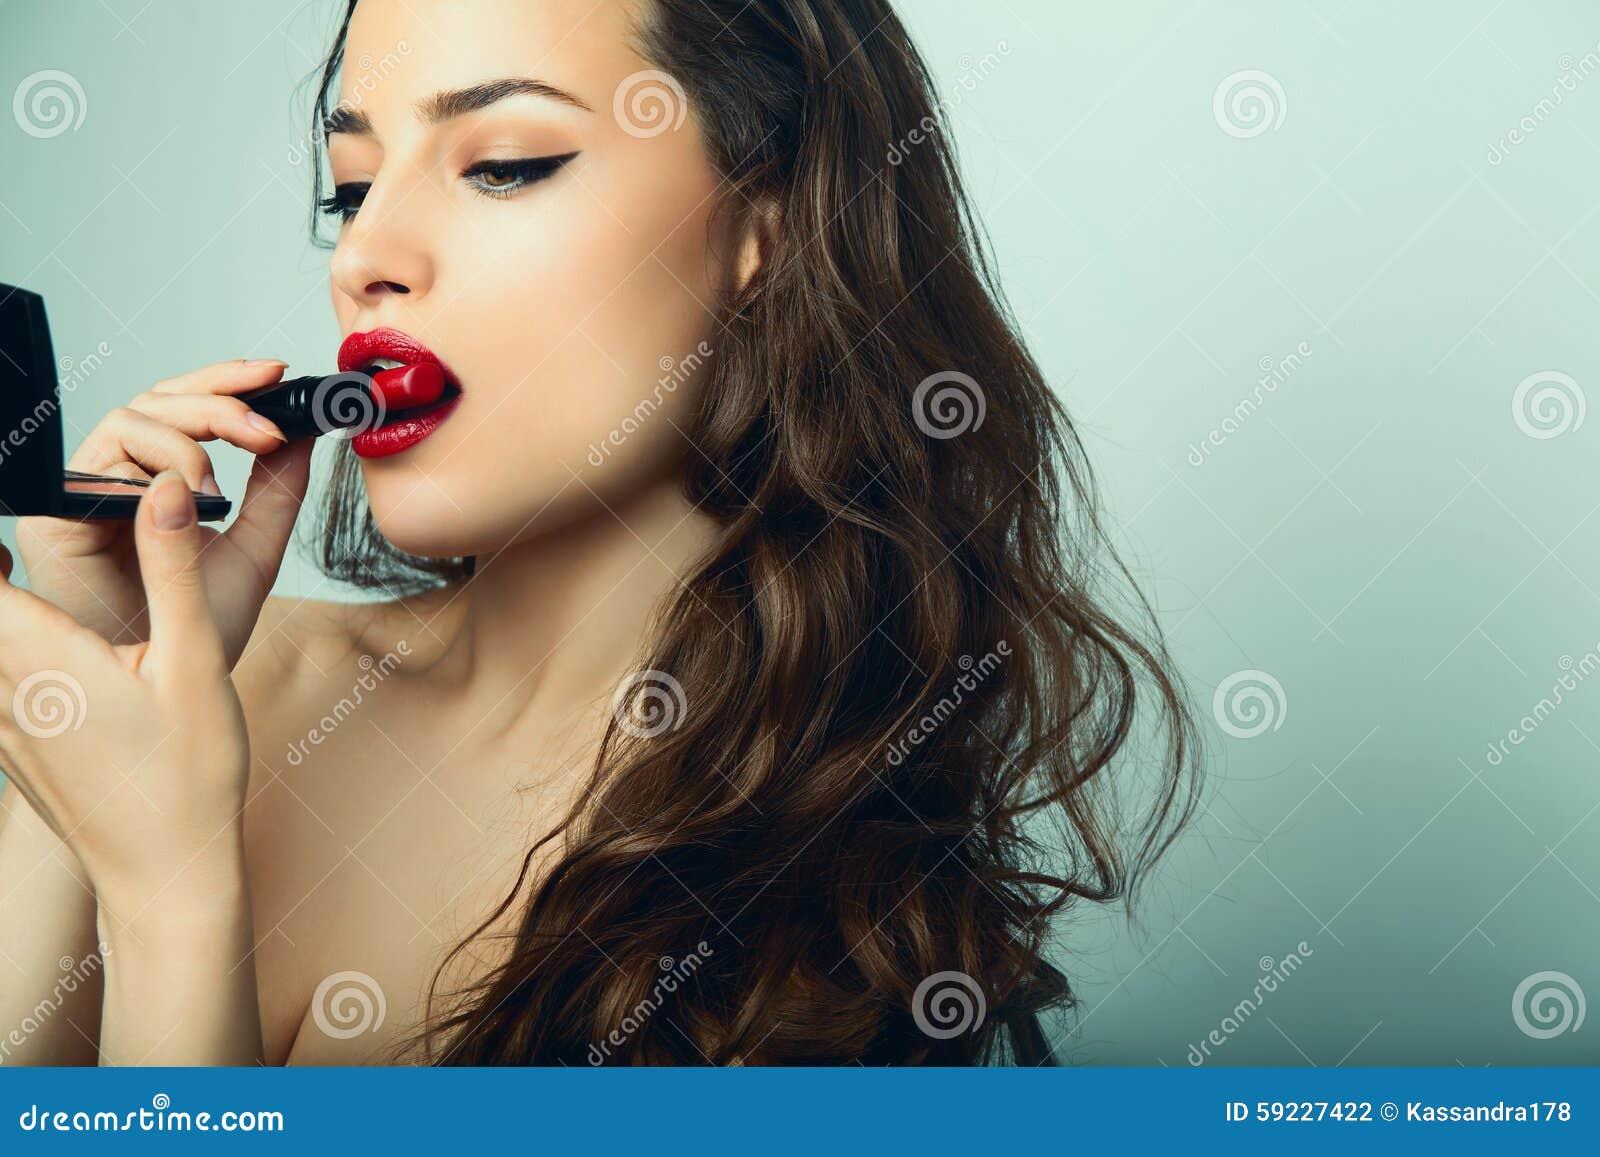 Download Maquillaje foto de archivo. Imagen de mirada, mordedura - 59227422